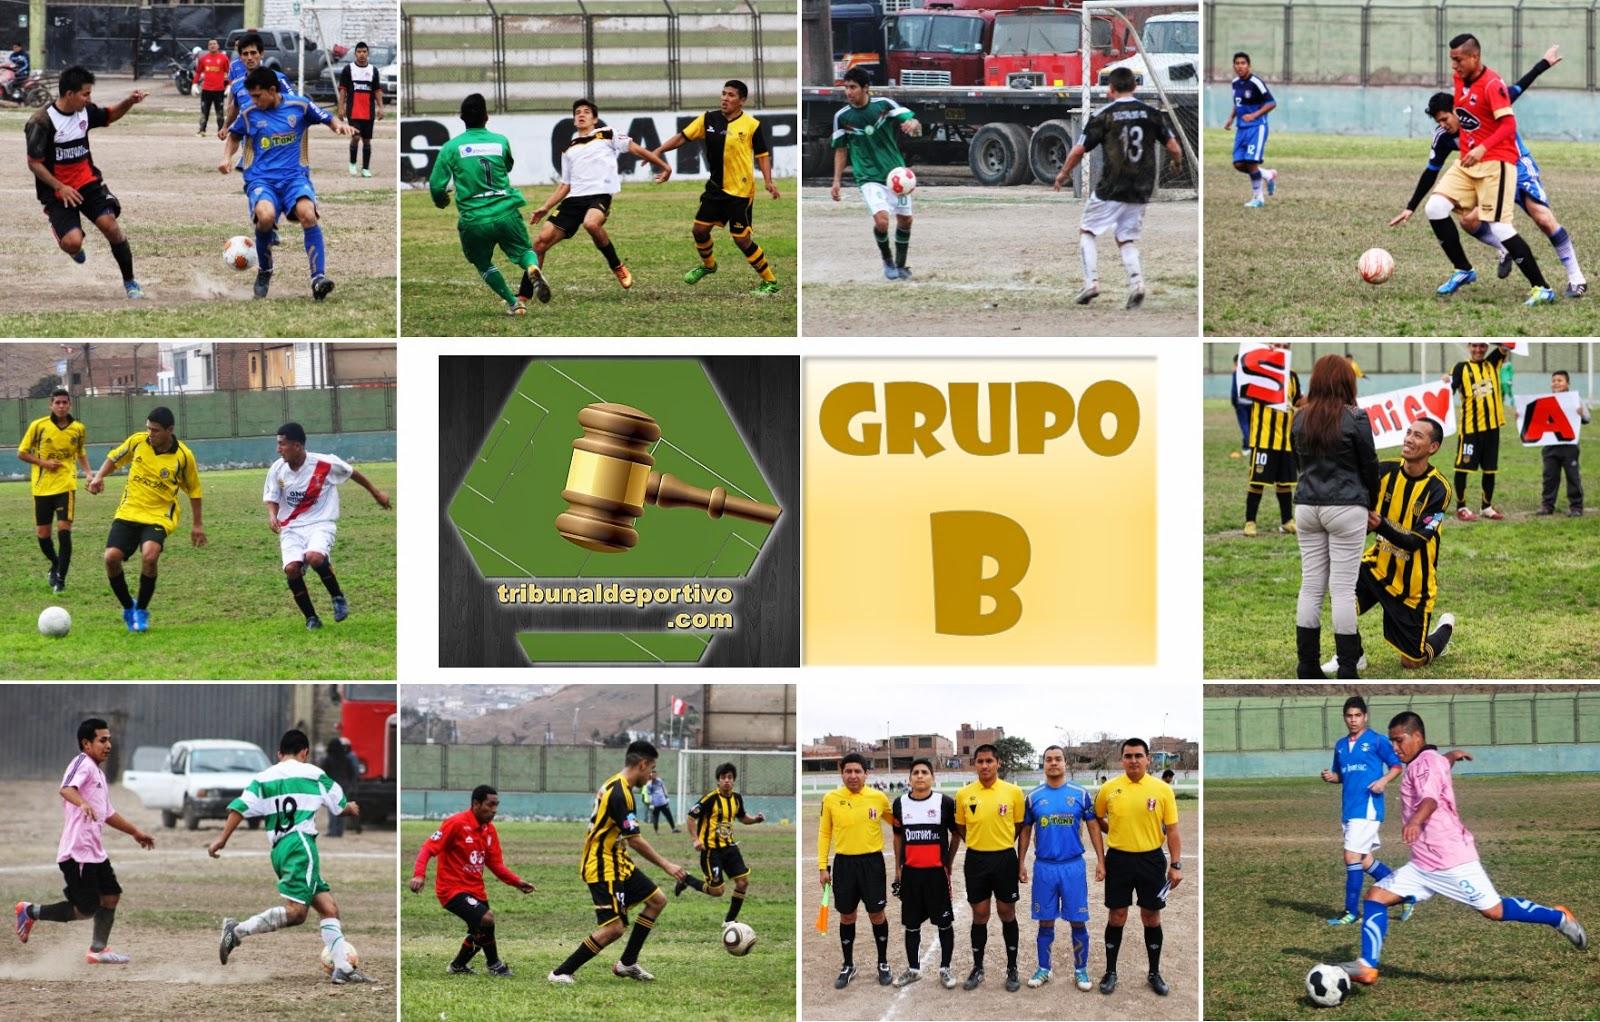 http://tribunal-deportivo.blogspot.com/2014/09/departamental-callao-1-fase-grupo-b.html